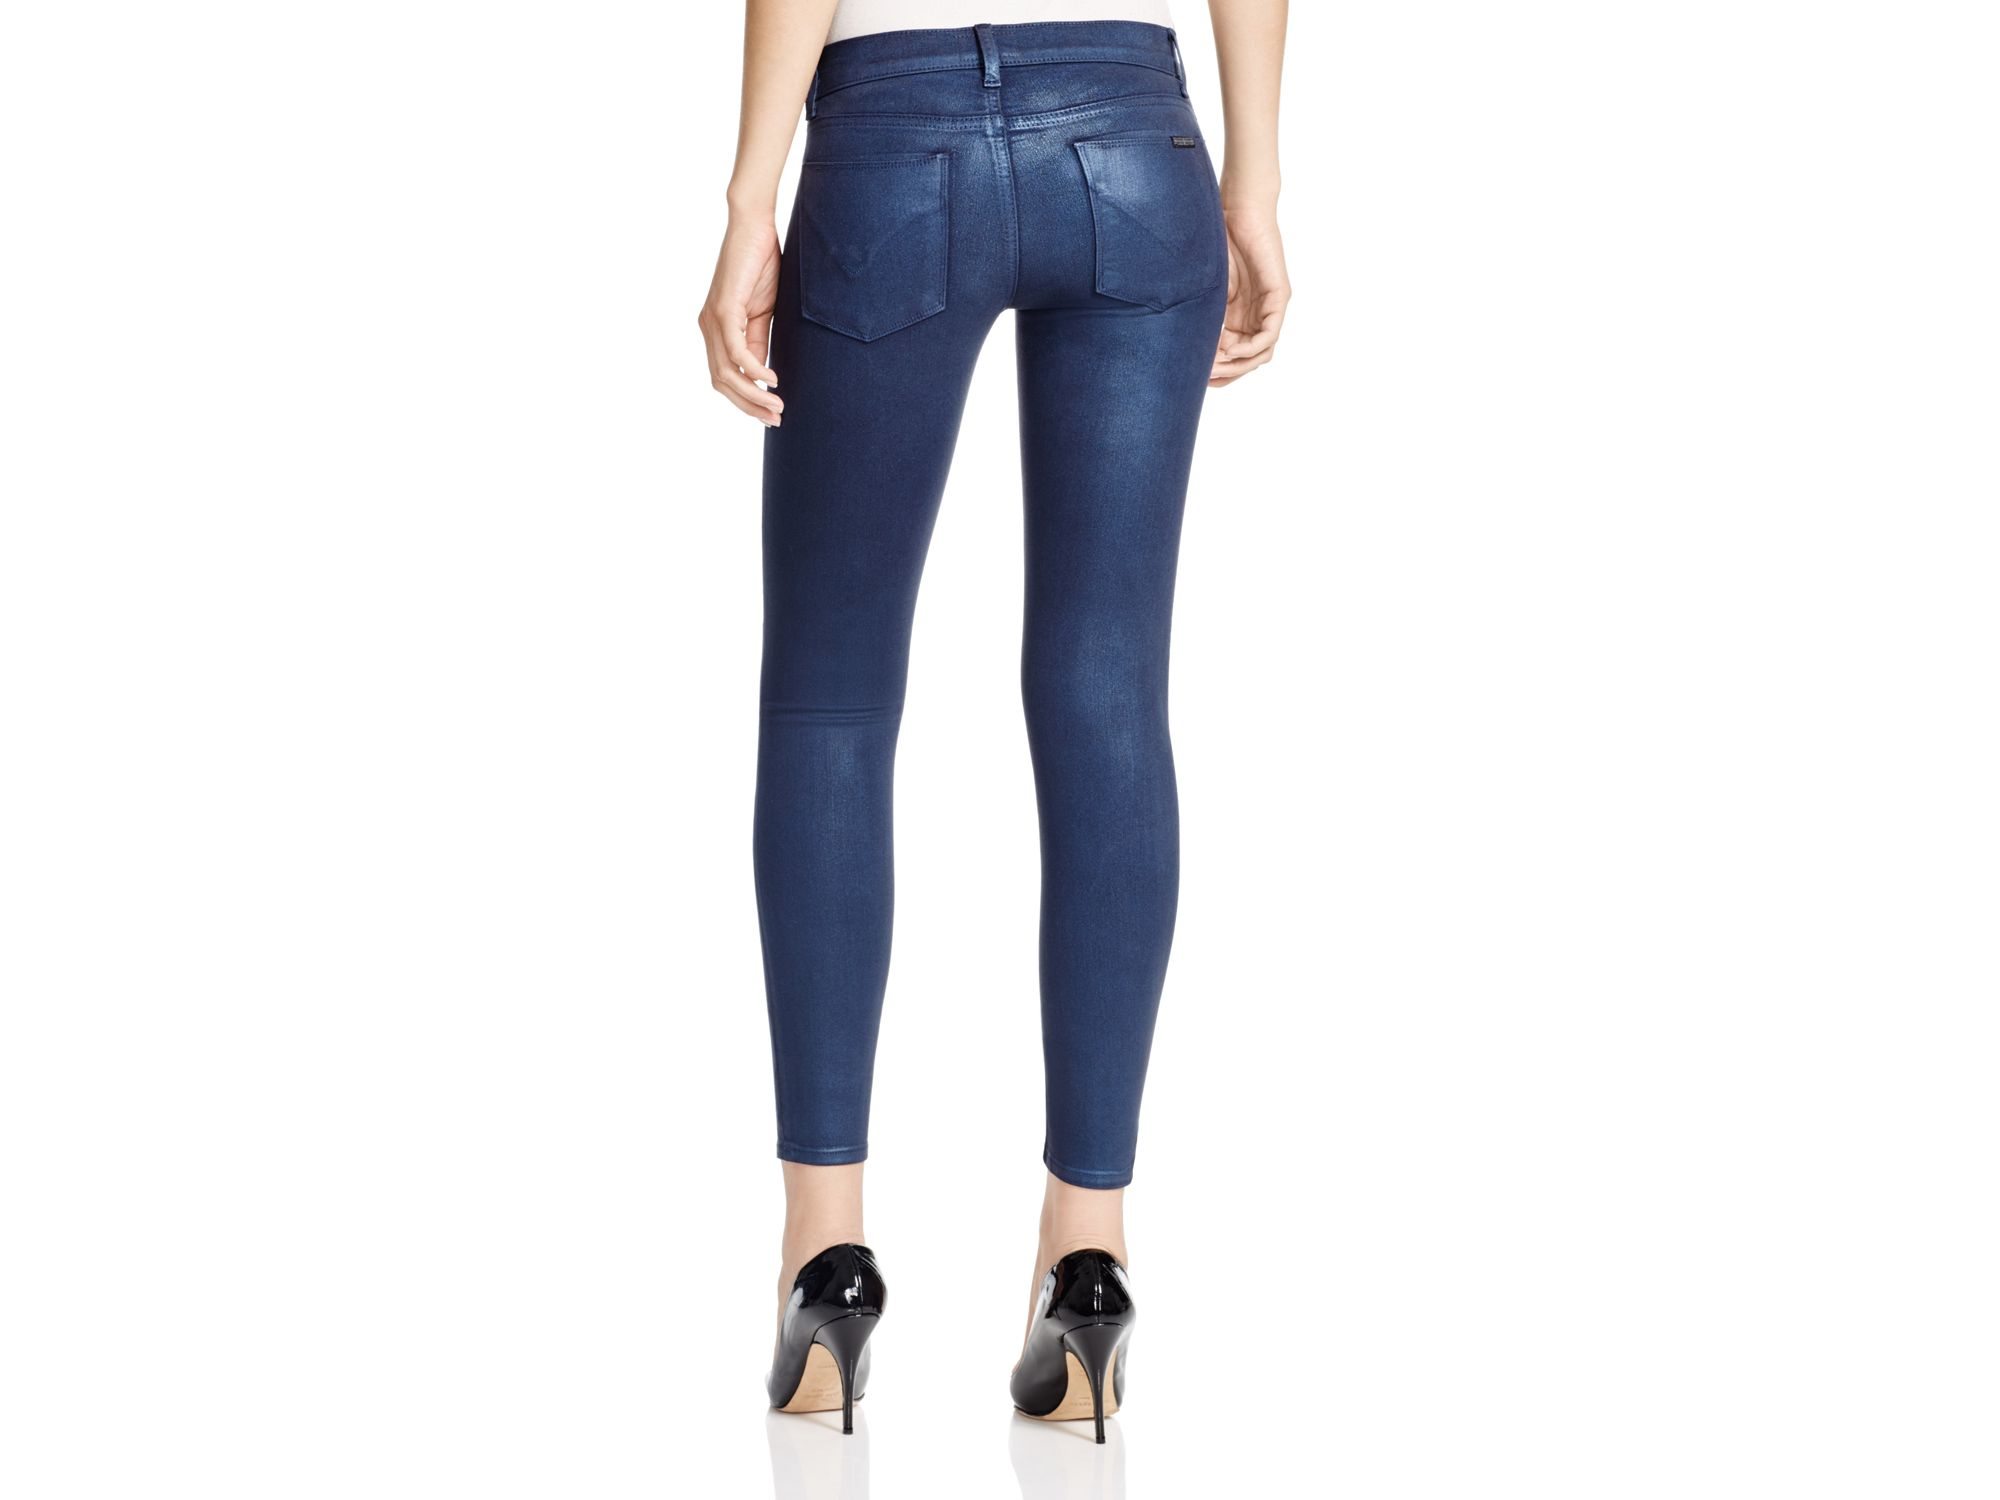 63e2e761 Hudson Jeans Krista Ankle Super Skinny Jeans In Metallic Midnight in Blue -  Lyst